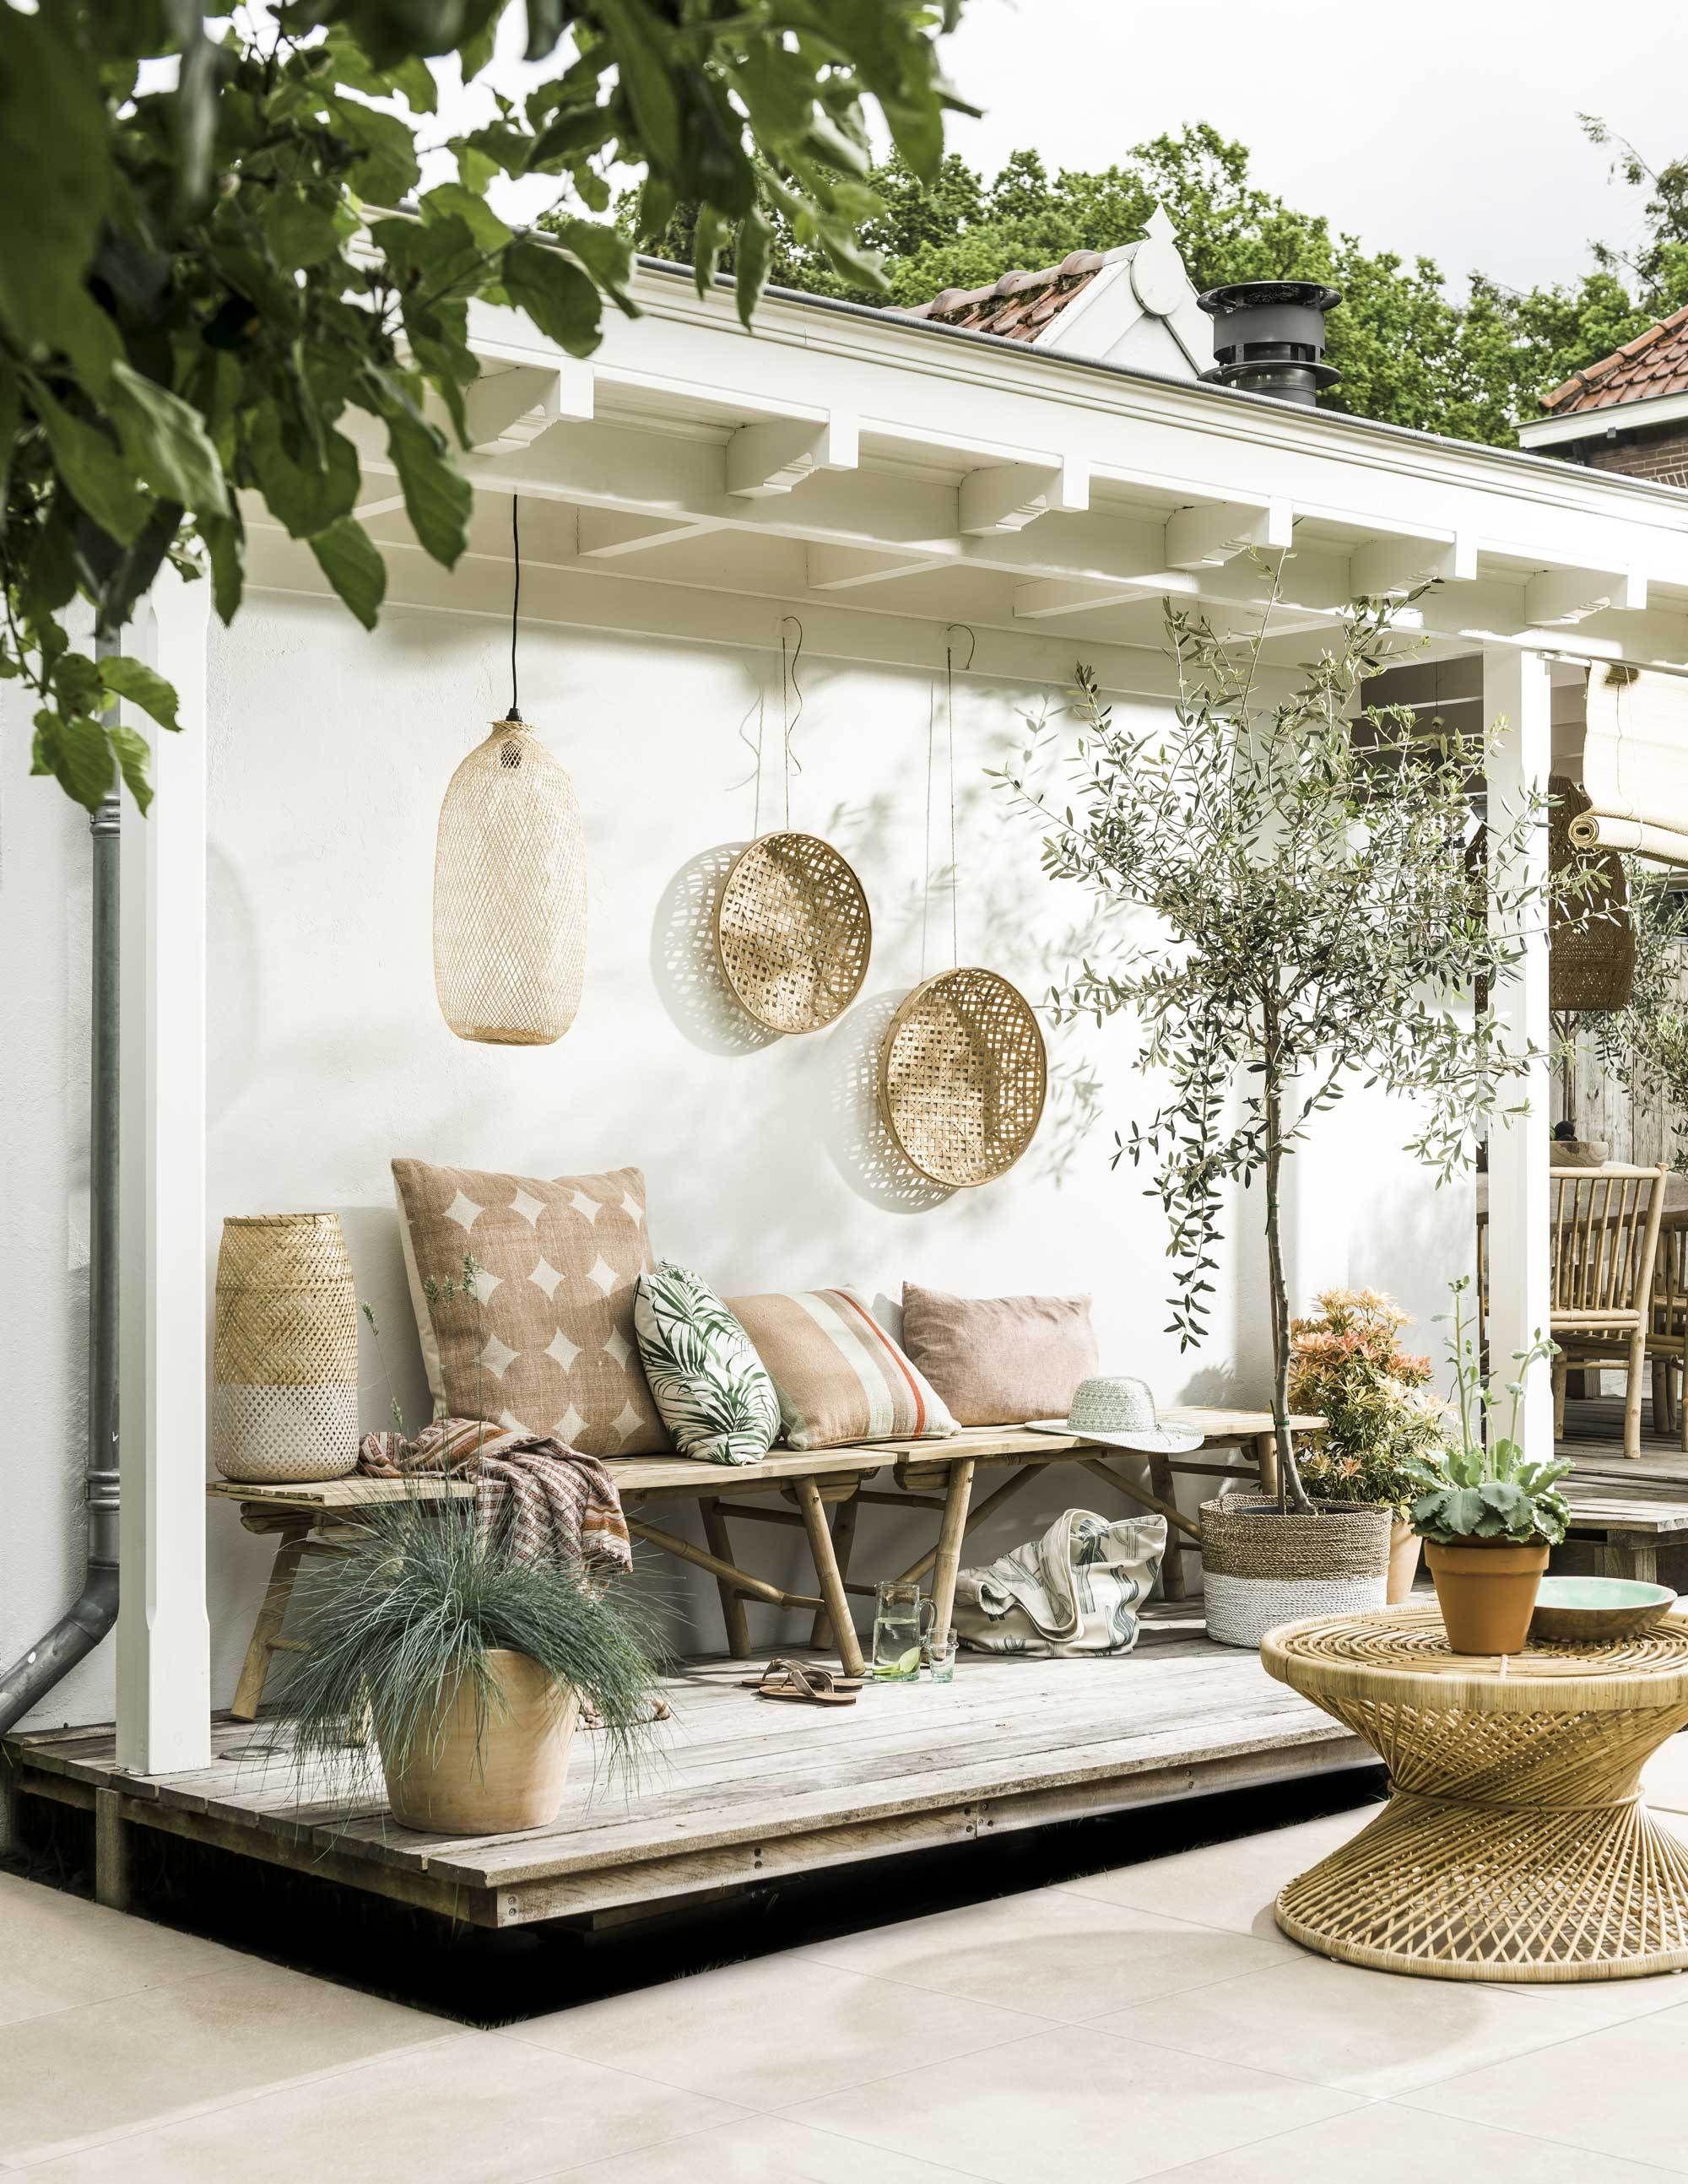 Pin by Tess Baltazar on Home living room | Jardins, Extérieur, Déco ...